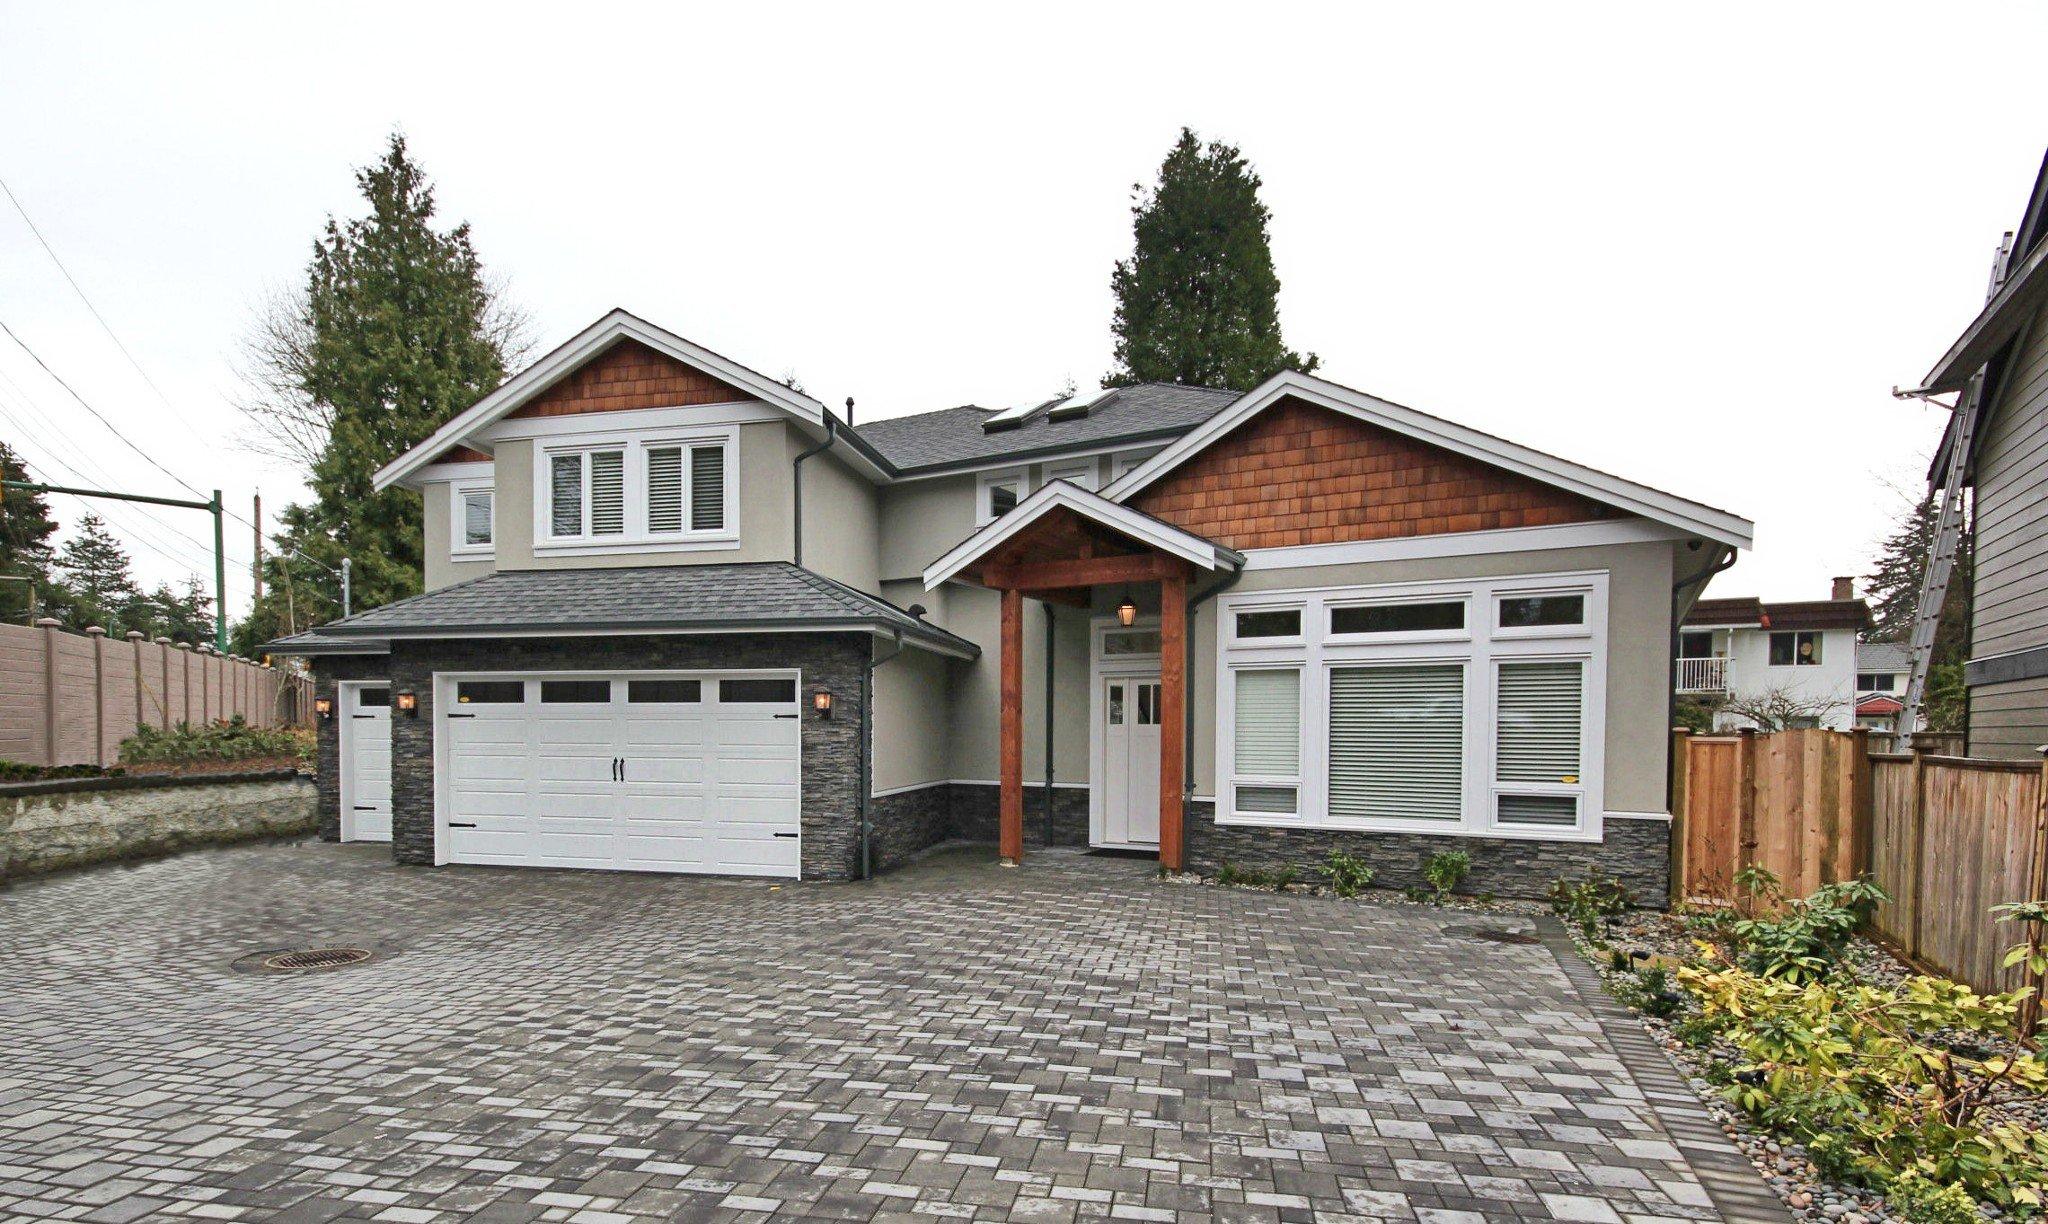 Main Photo: 5670 Kincaid Street in Burnaby: Deer Lake House for sale (Burnaby South)